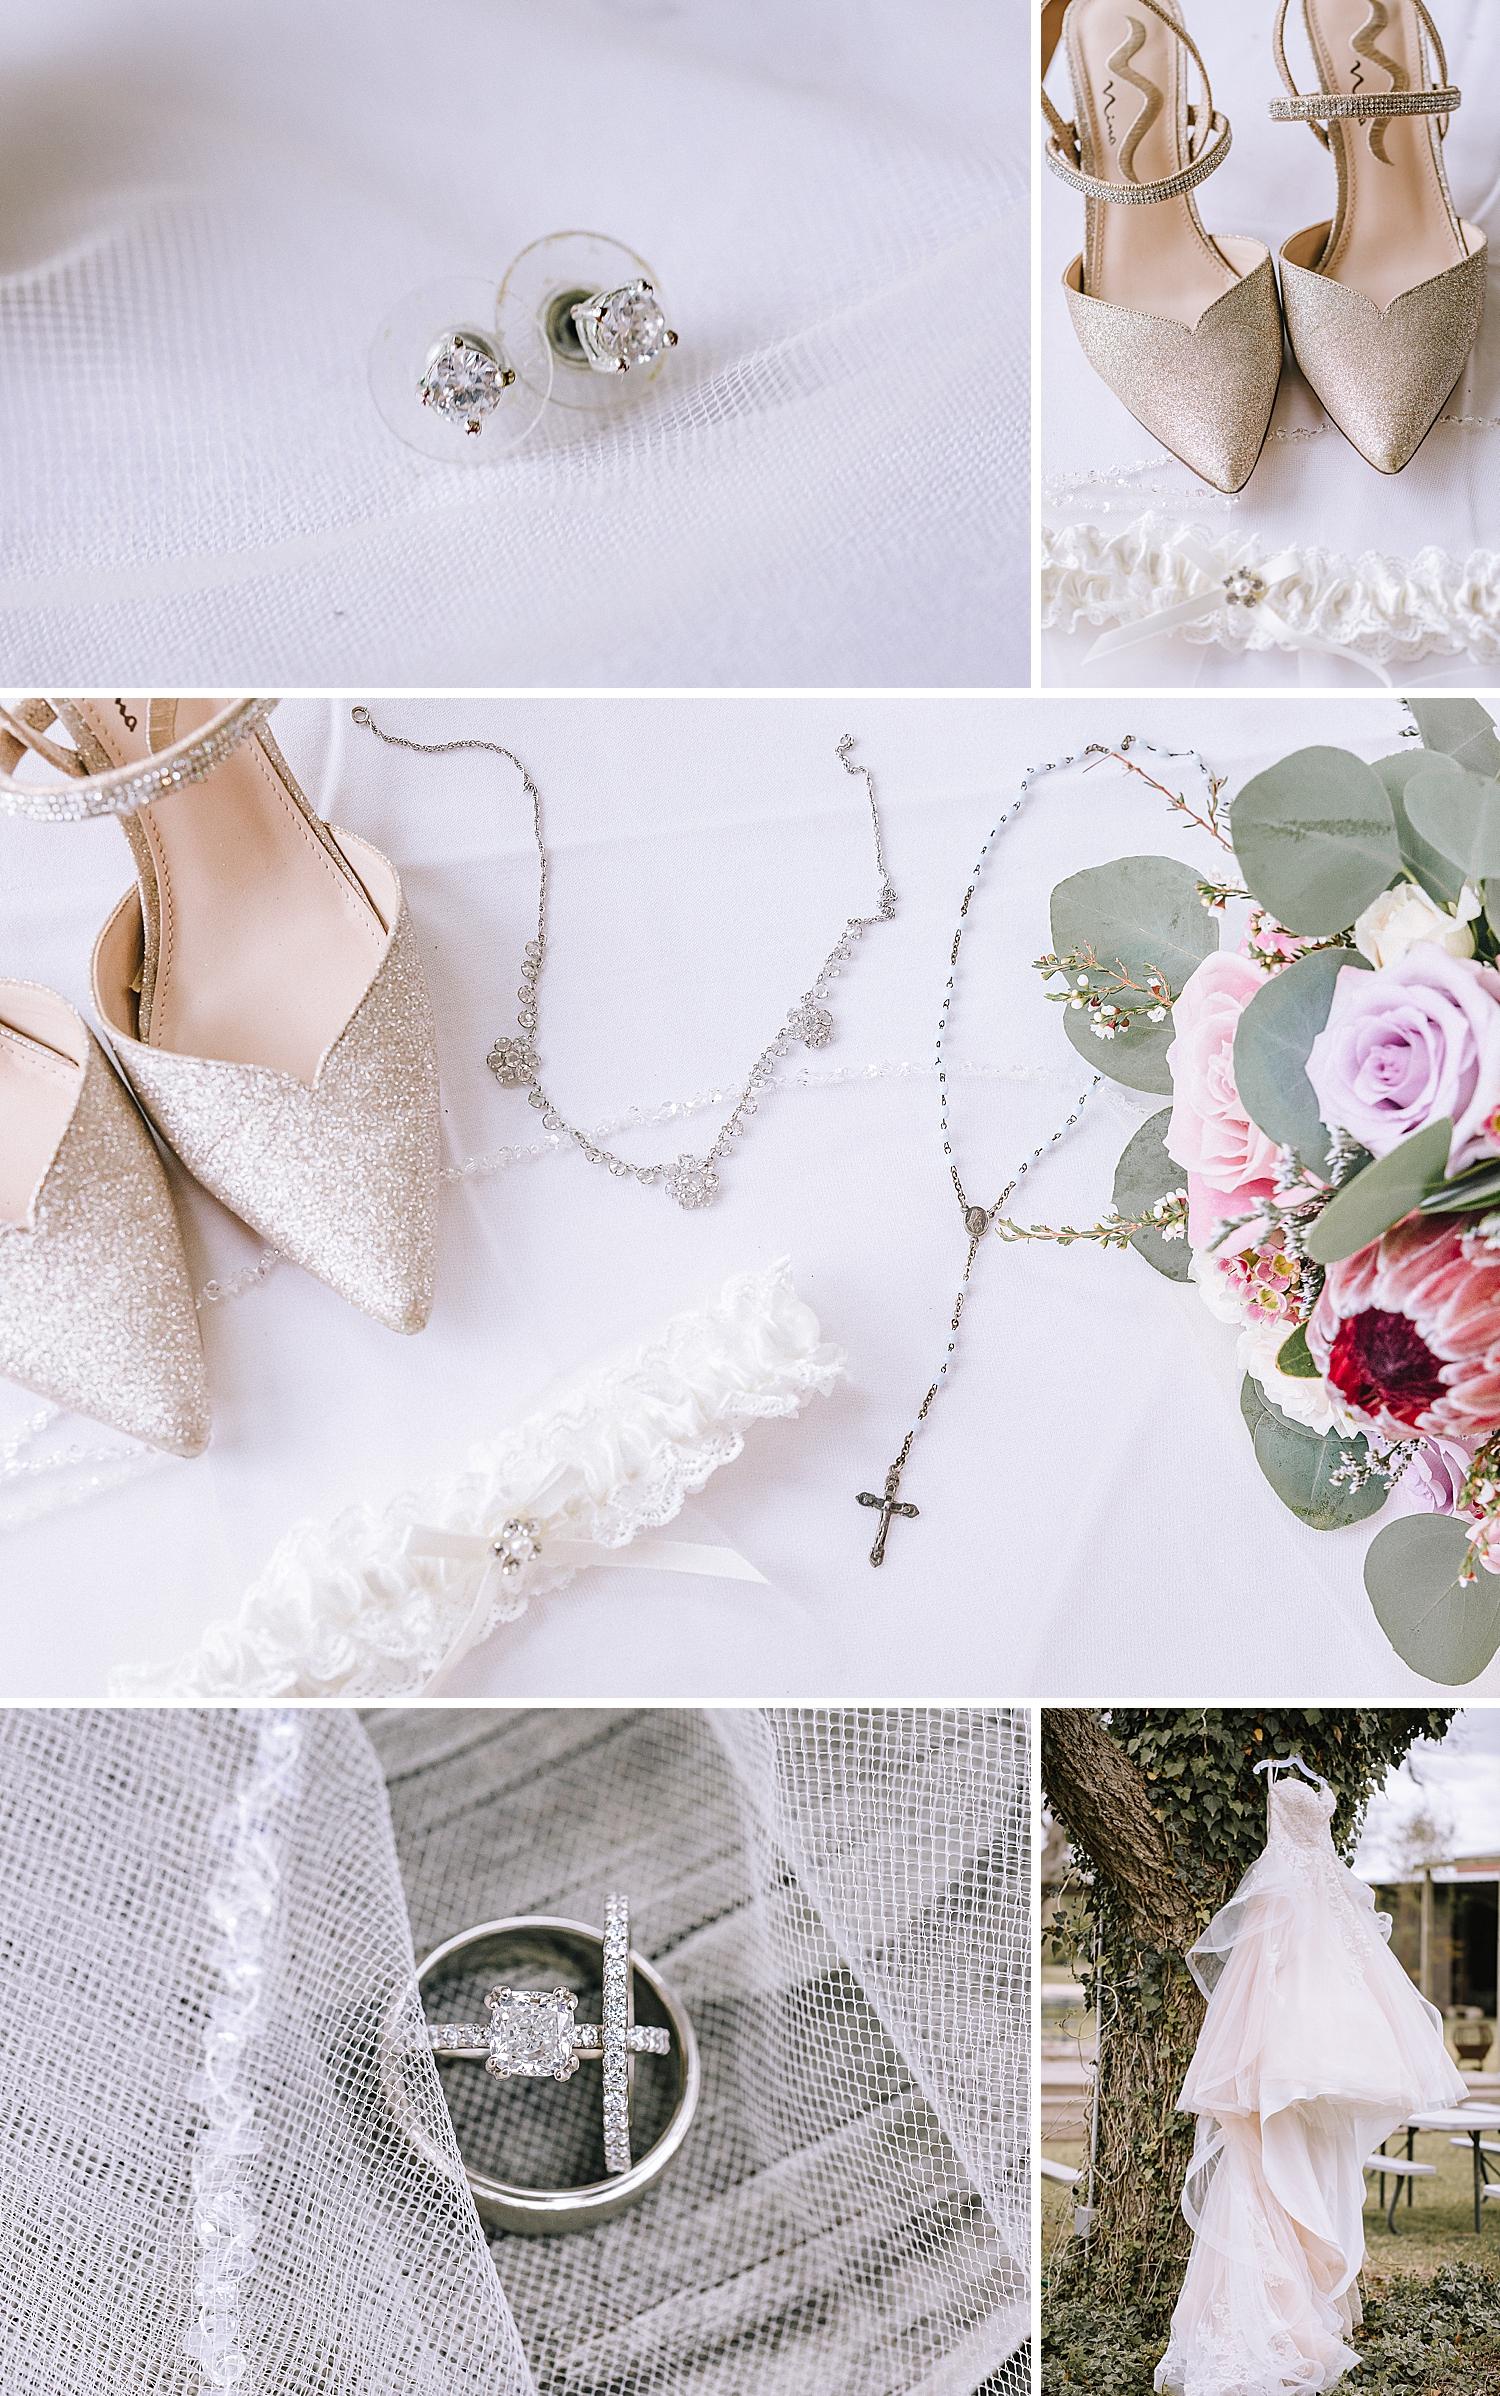 Rio-Cibilo-Ranch-Marion-Texas-Wedding-Rustic-Blush-Rose-Quartz-Details-Carly-Barton-Photography_0010.jpg